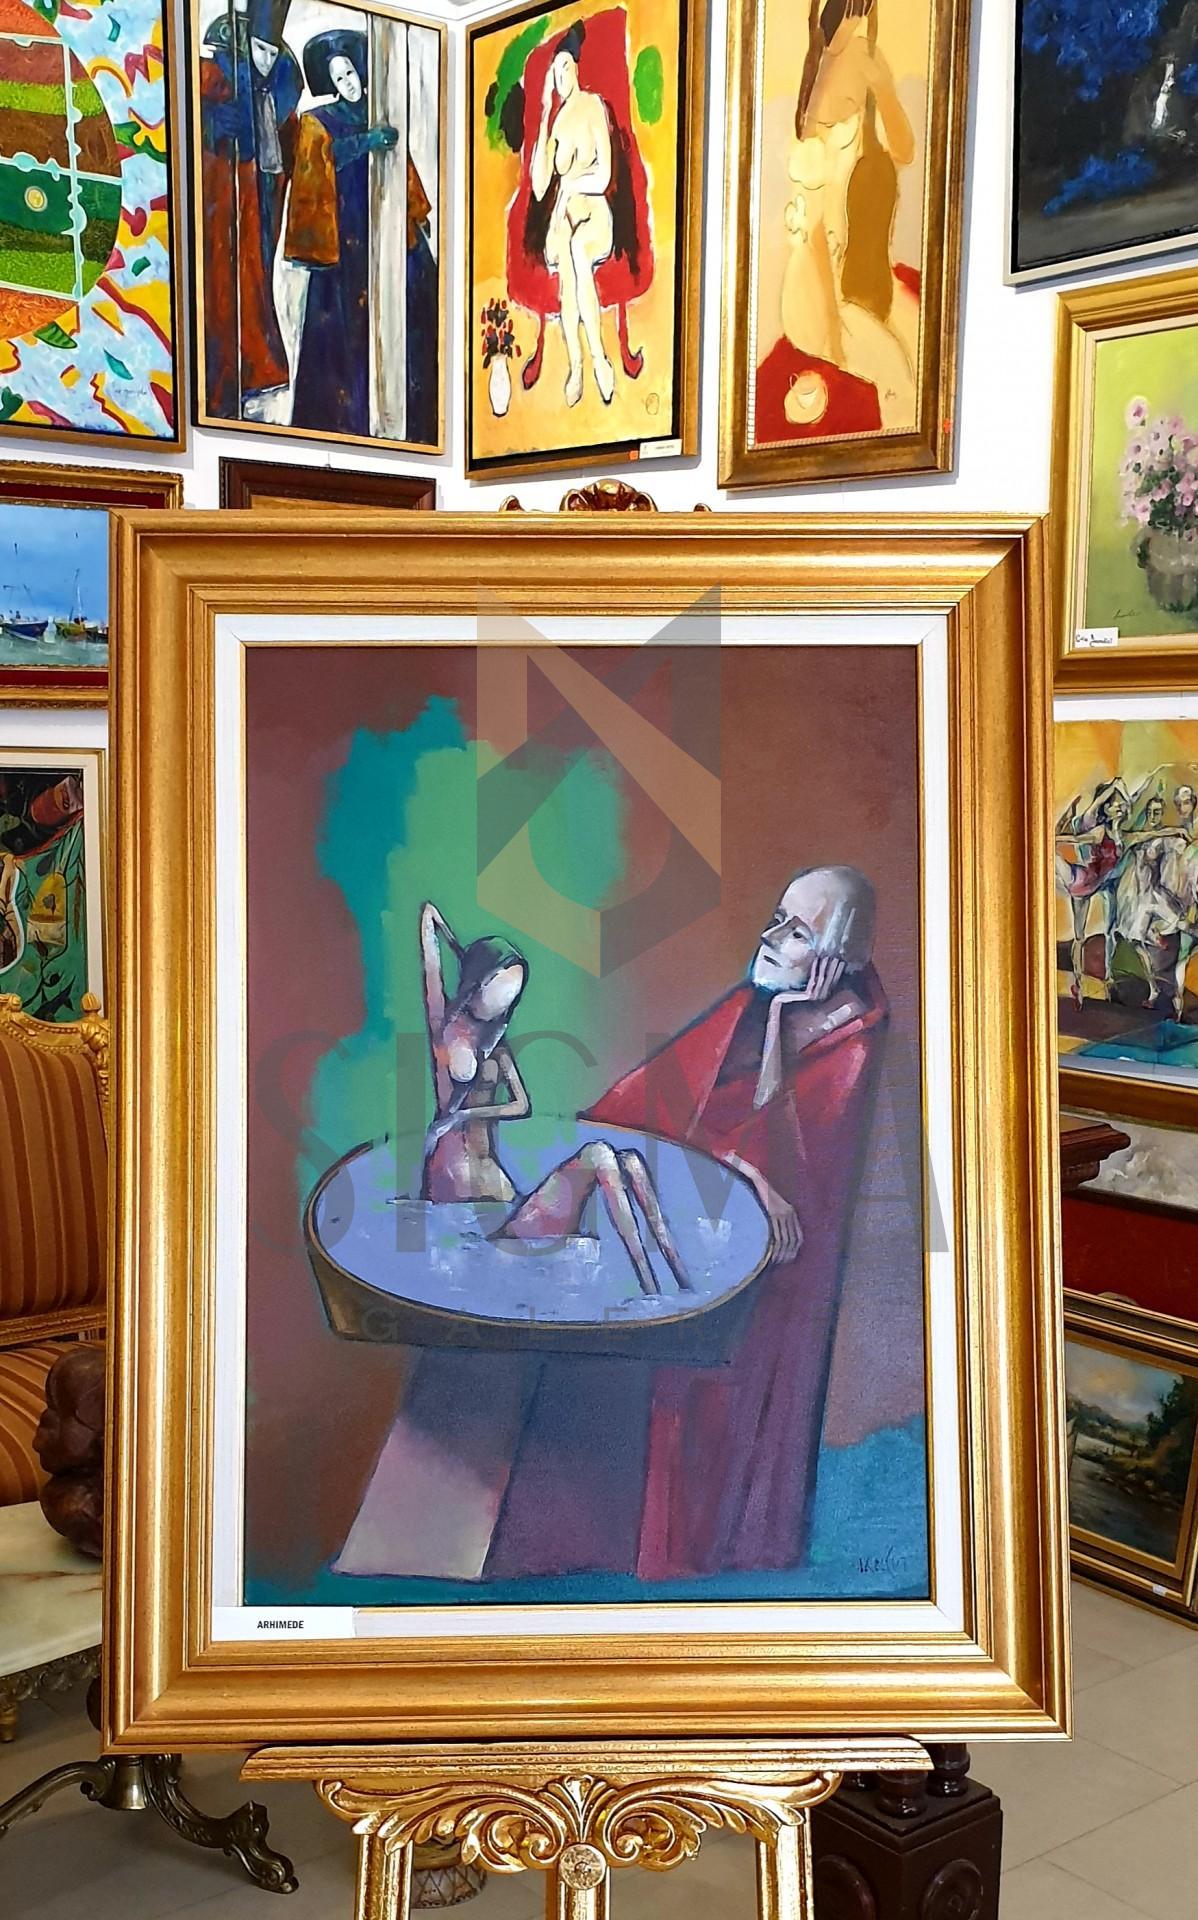 "Tablou, Ion Iancut, ""Arhimede"", ulei pe panza, 70x50 cm"